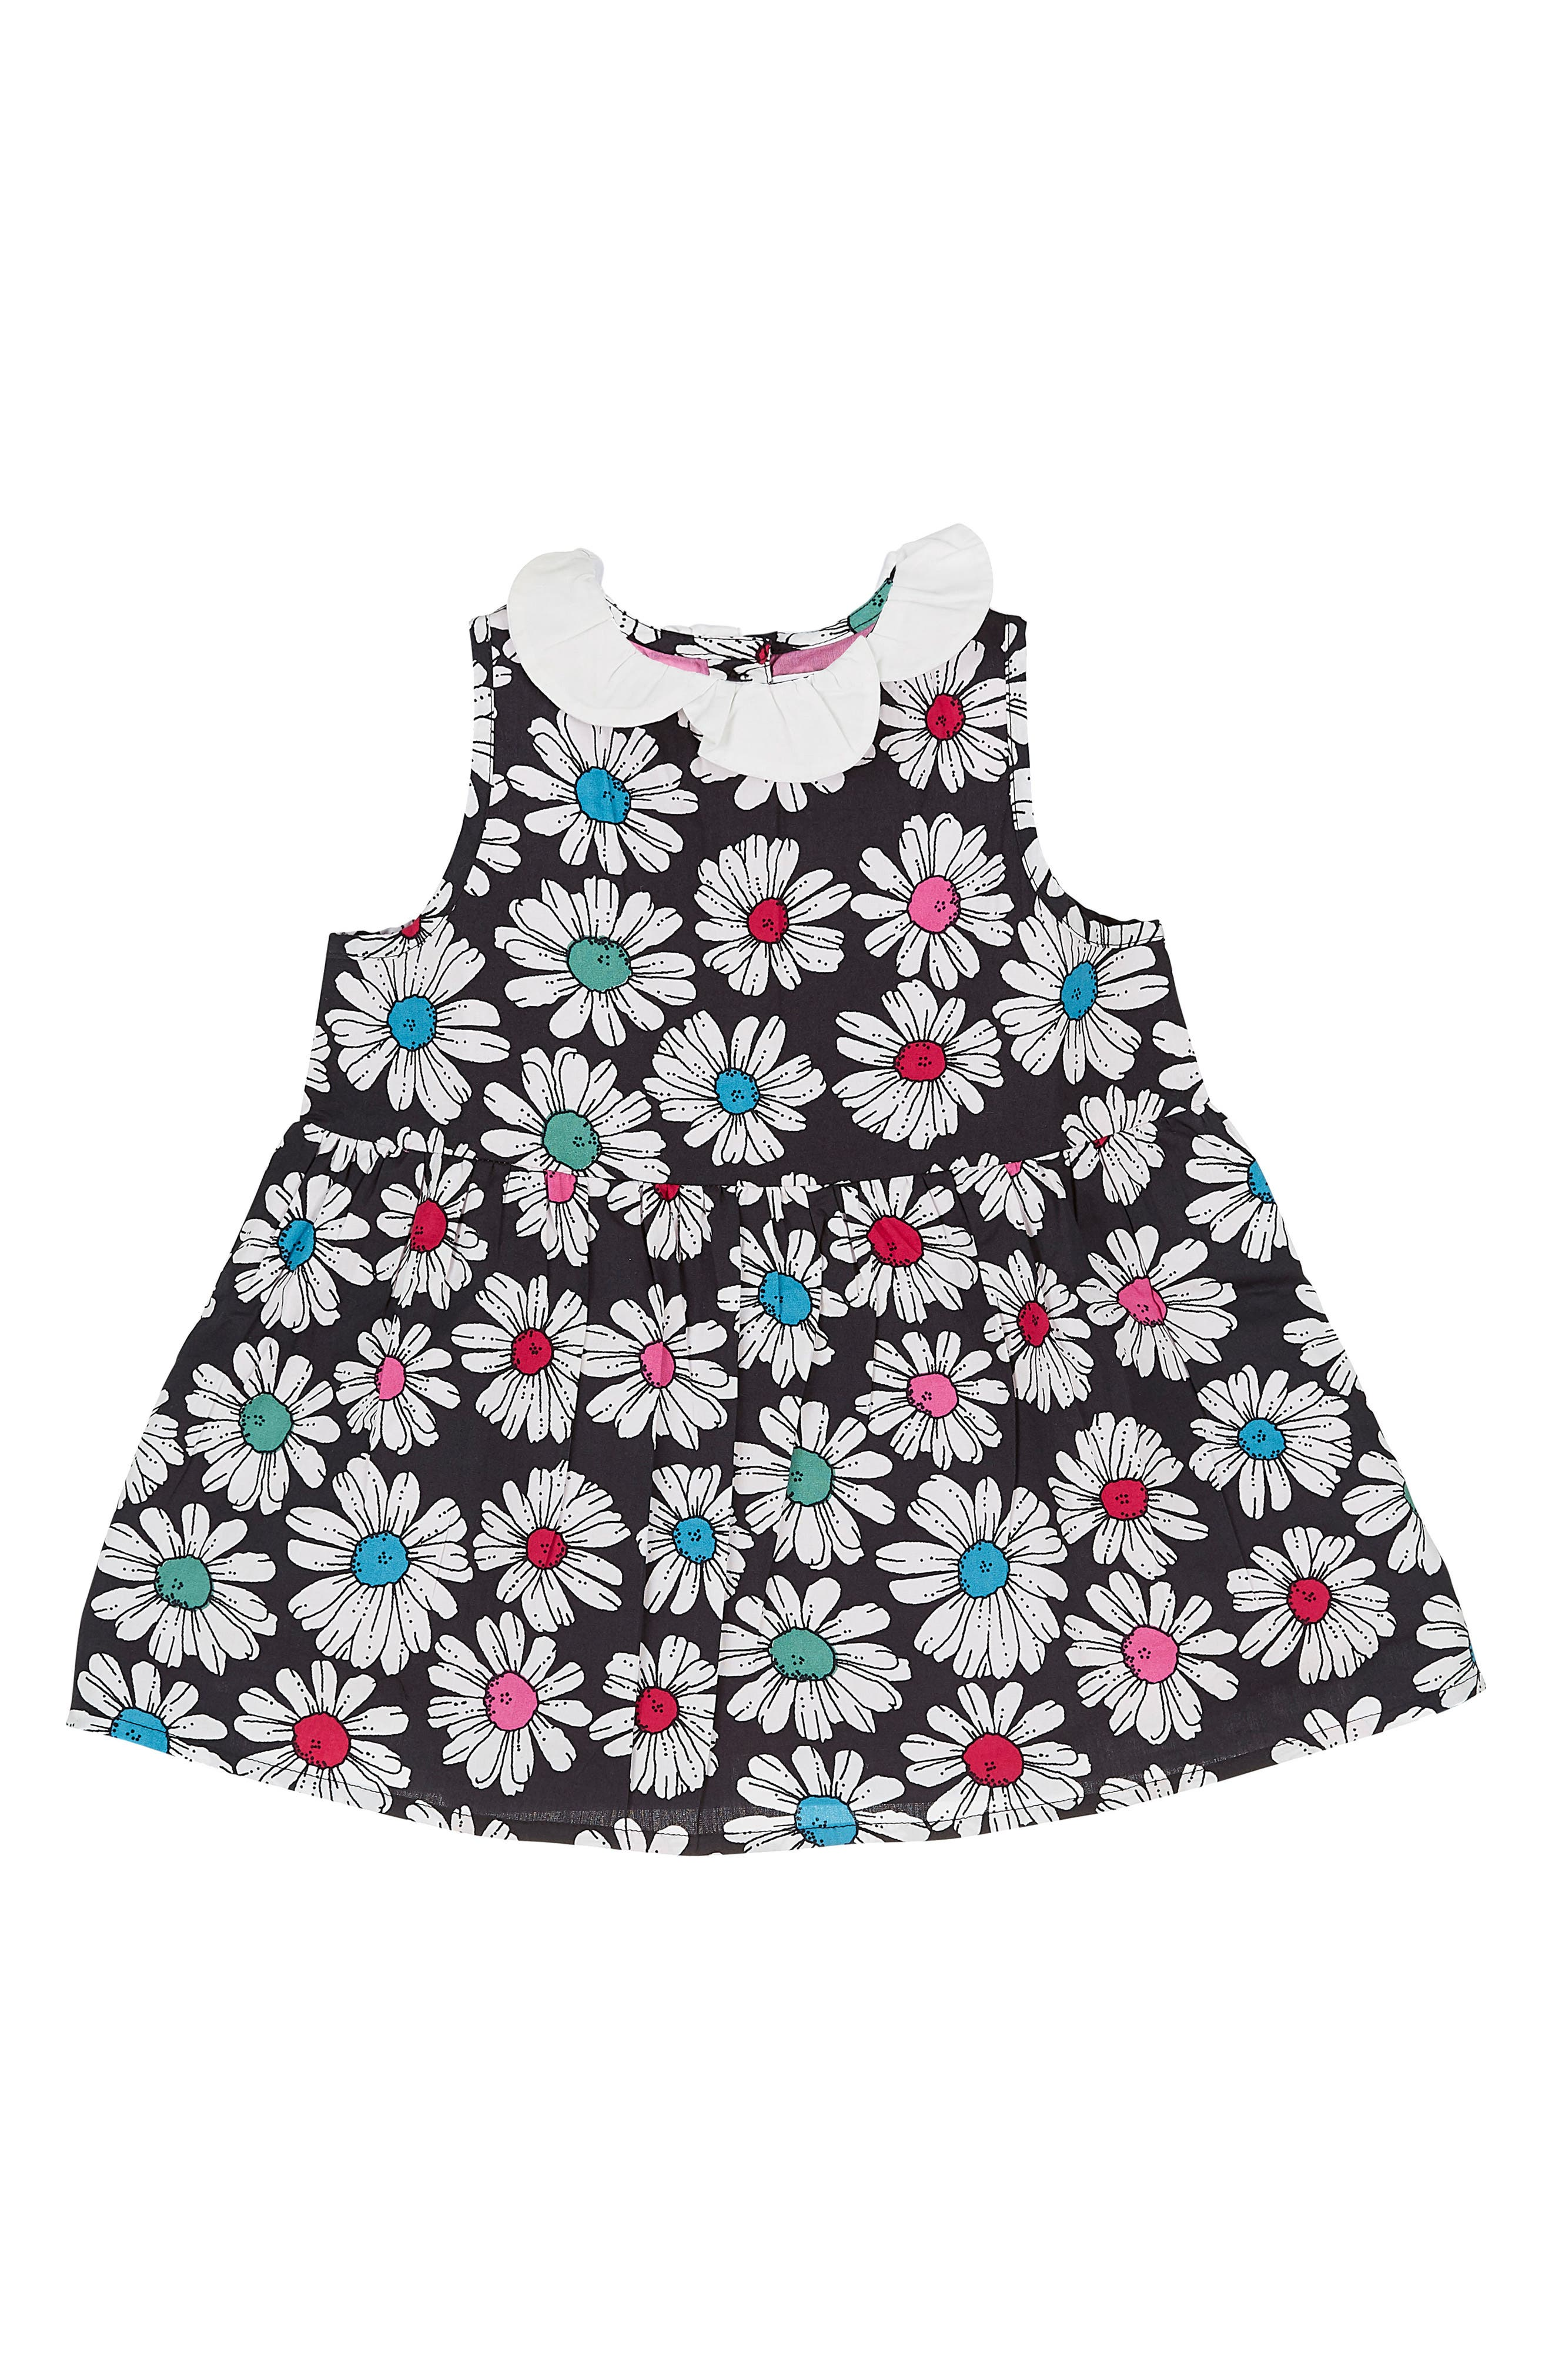 Main Image - Margherita Floral Print Dress (Toddler Girls & Little Girls)